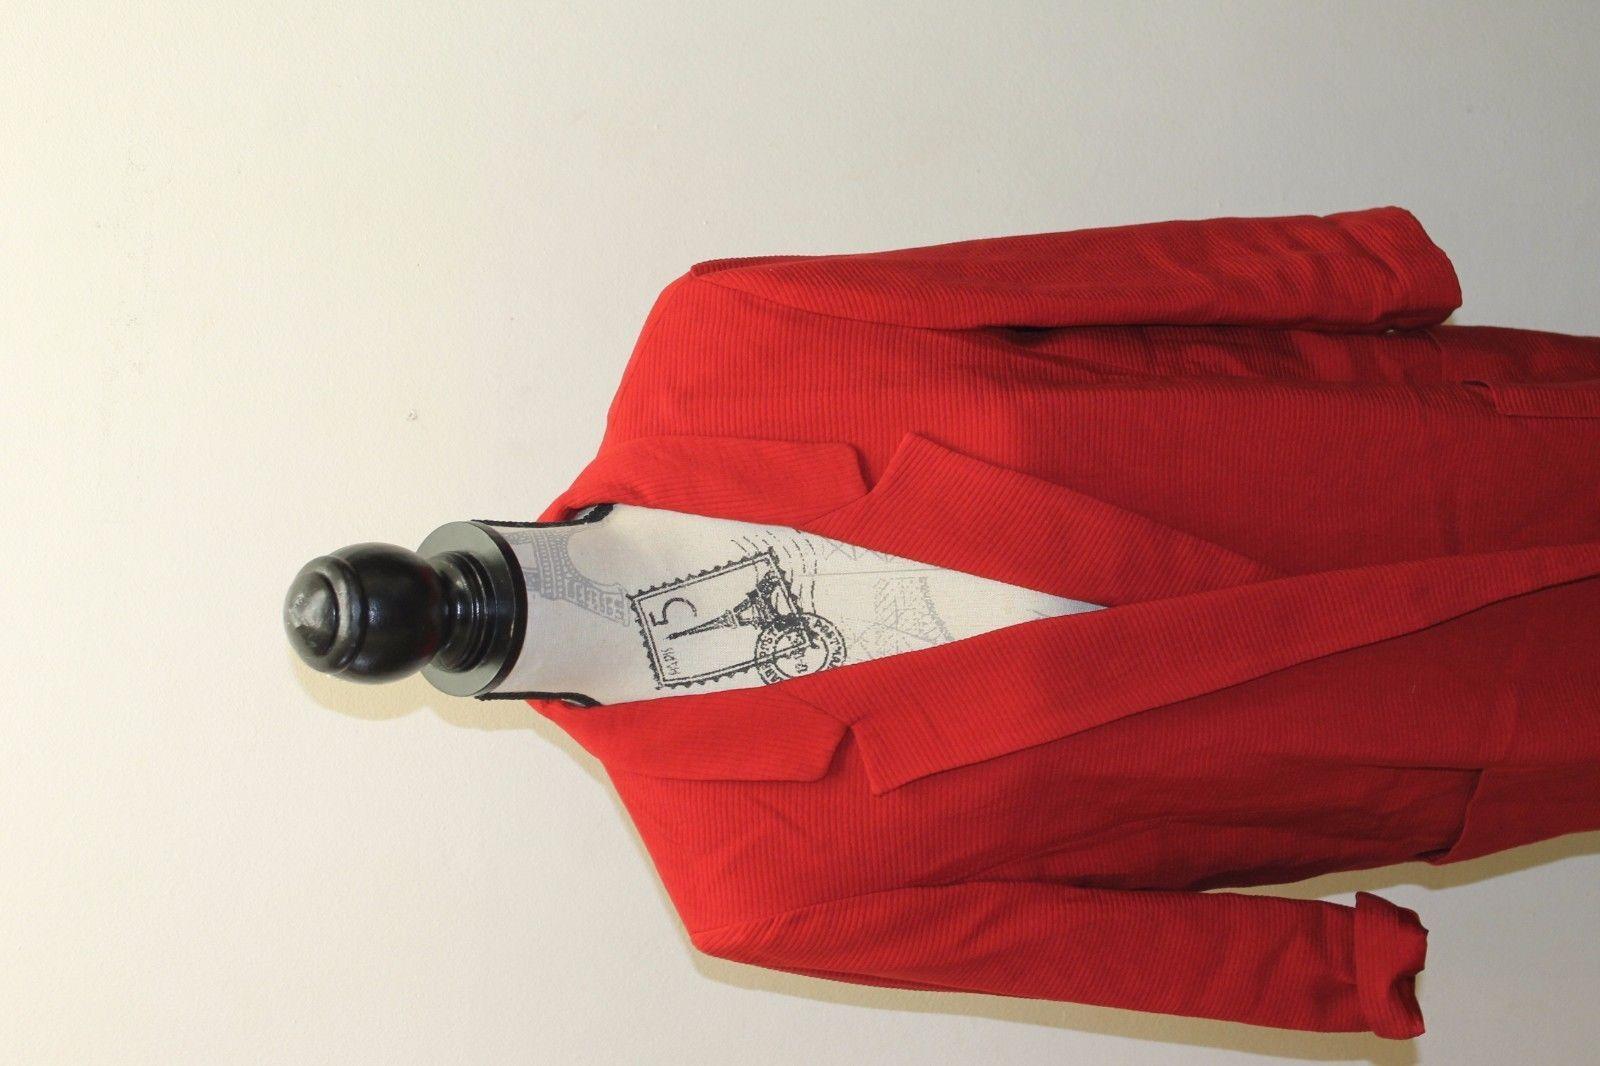 Zara Basic Open Women Long Blazer Red Textured Cotton Blend Large Lined